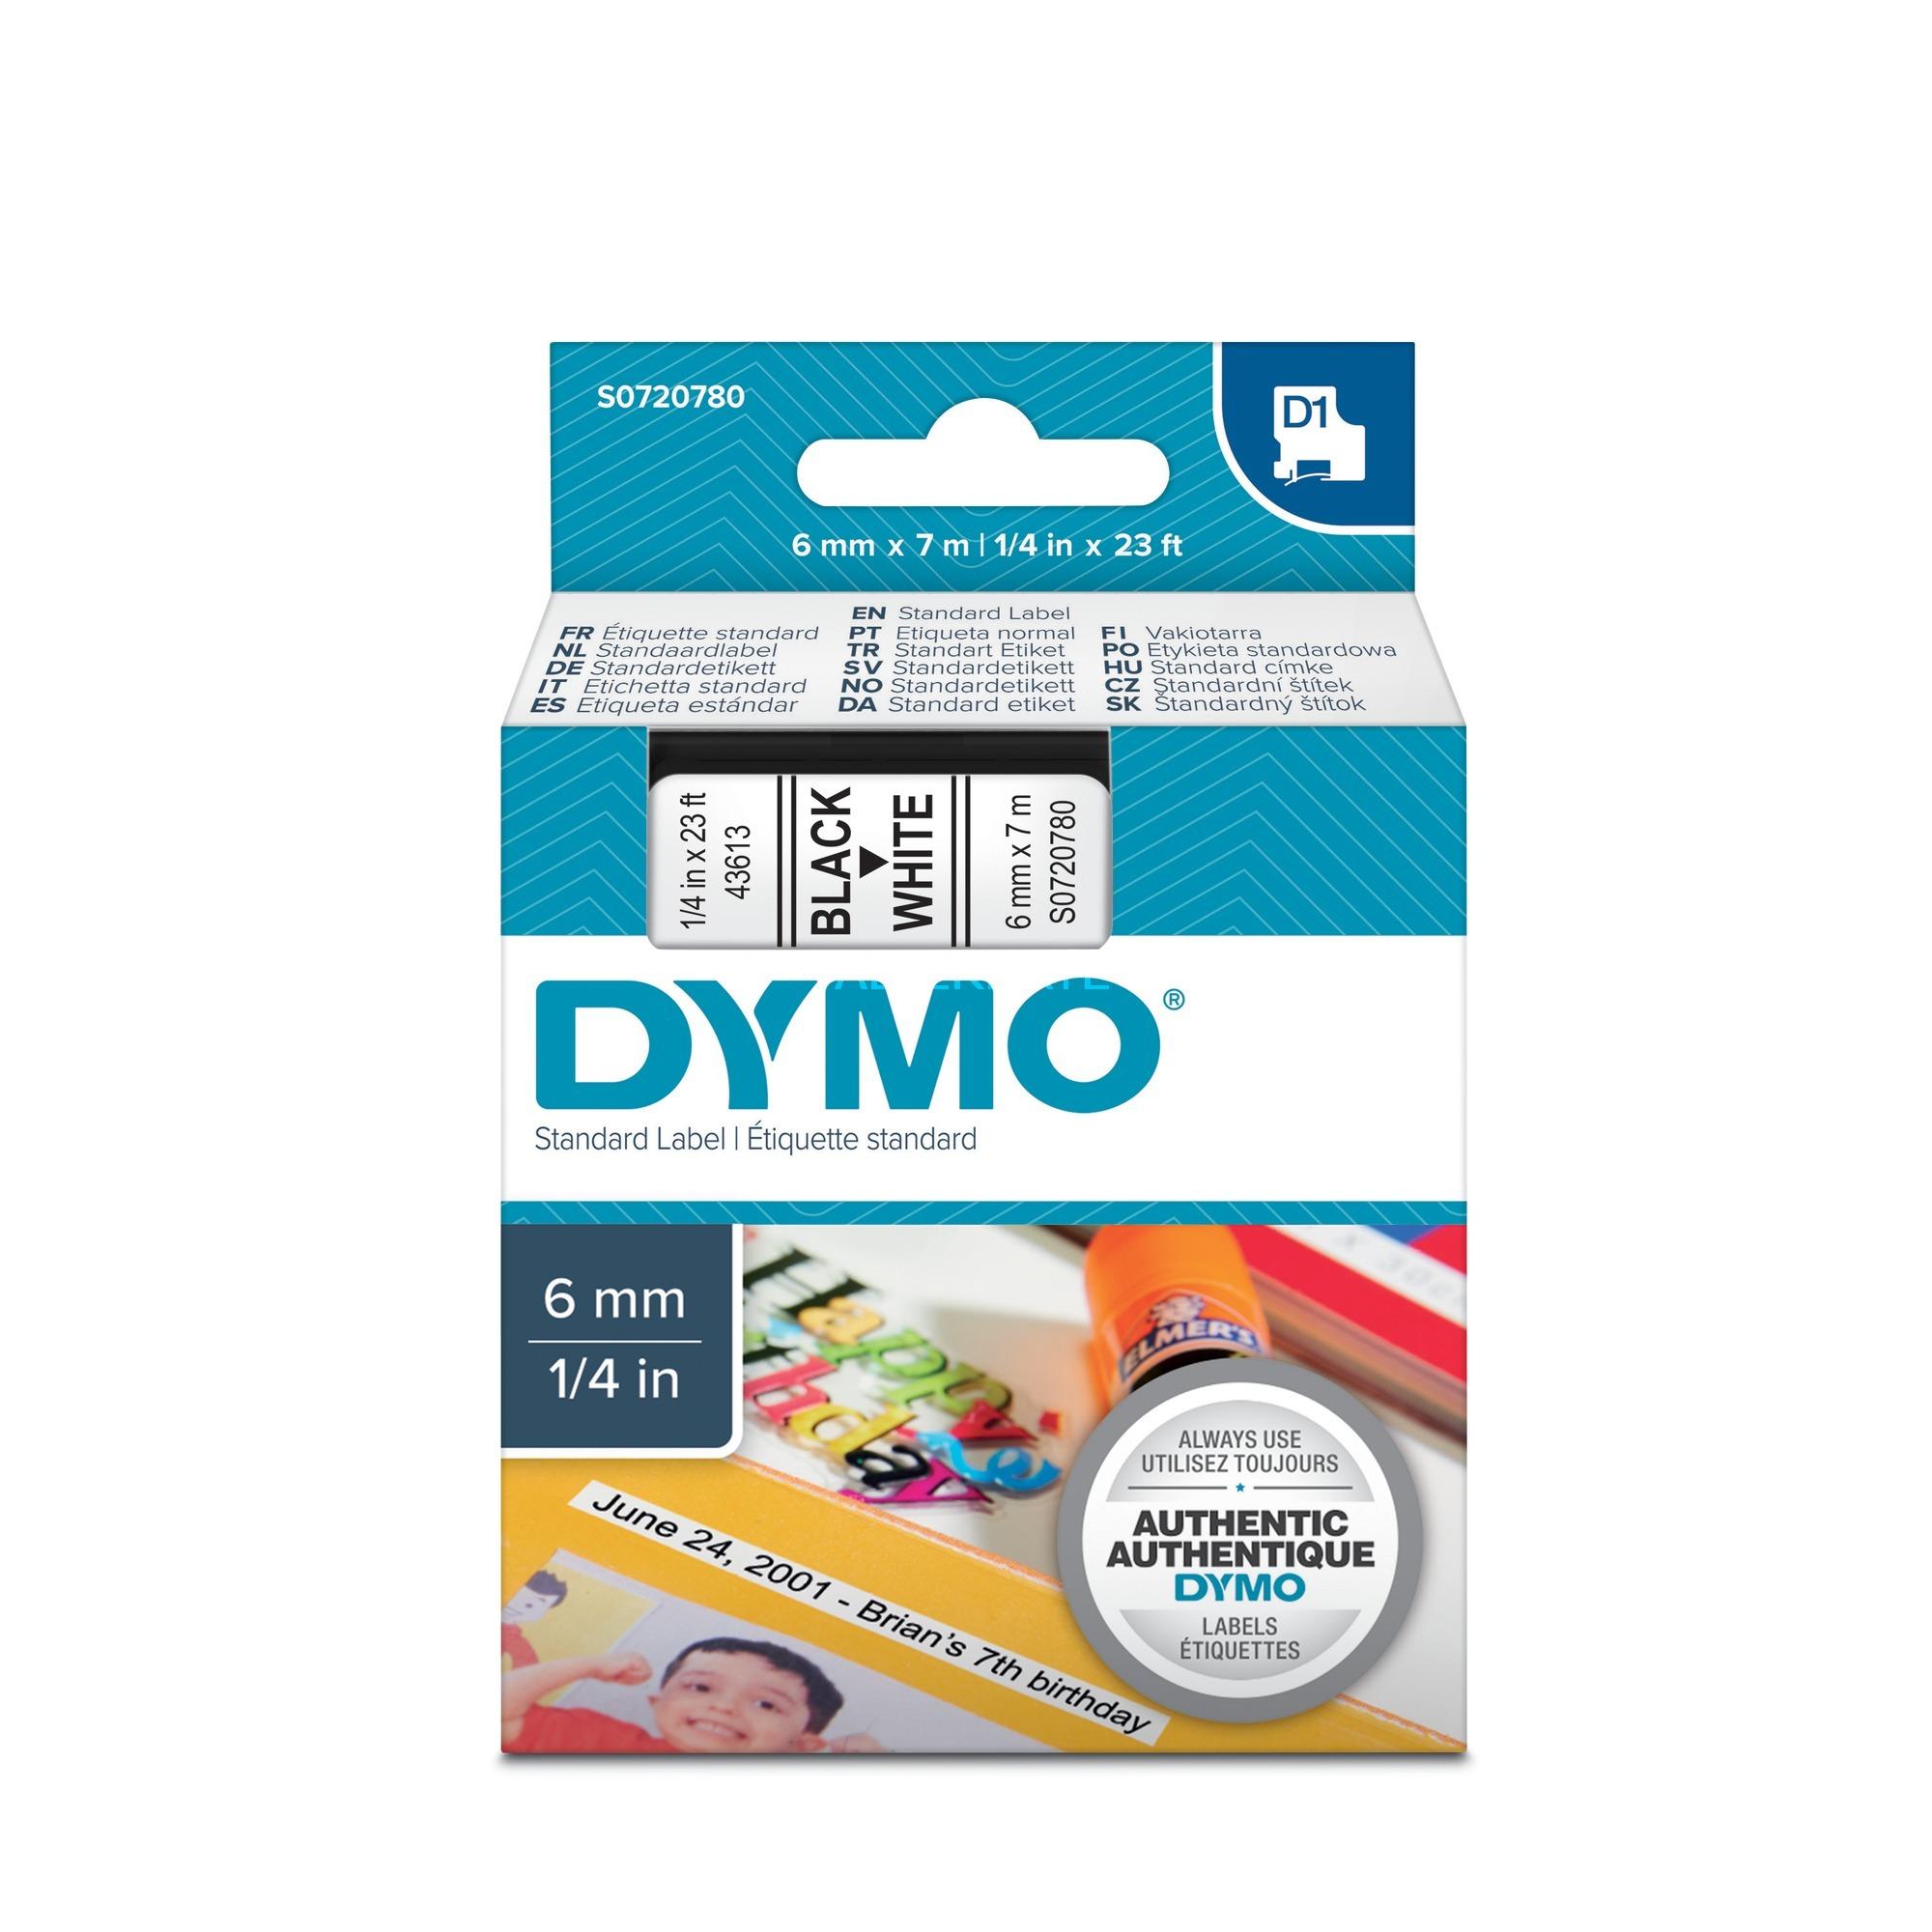 D1 Standard cinta para impresora de etiquetas, Cinta de escritura